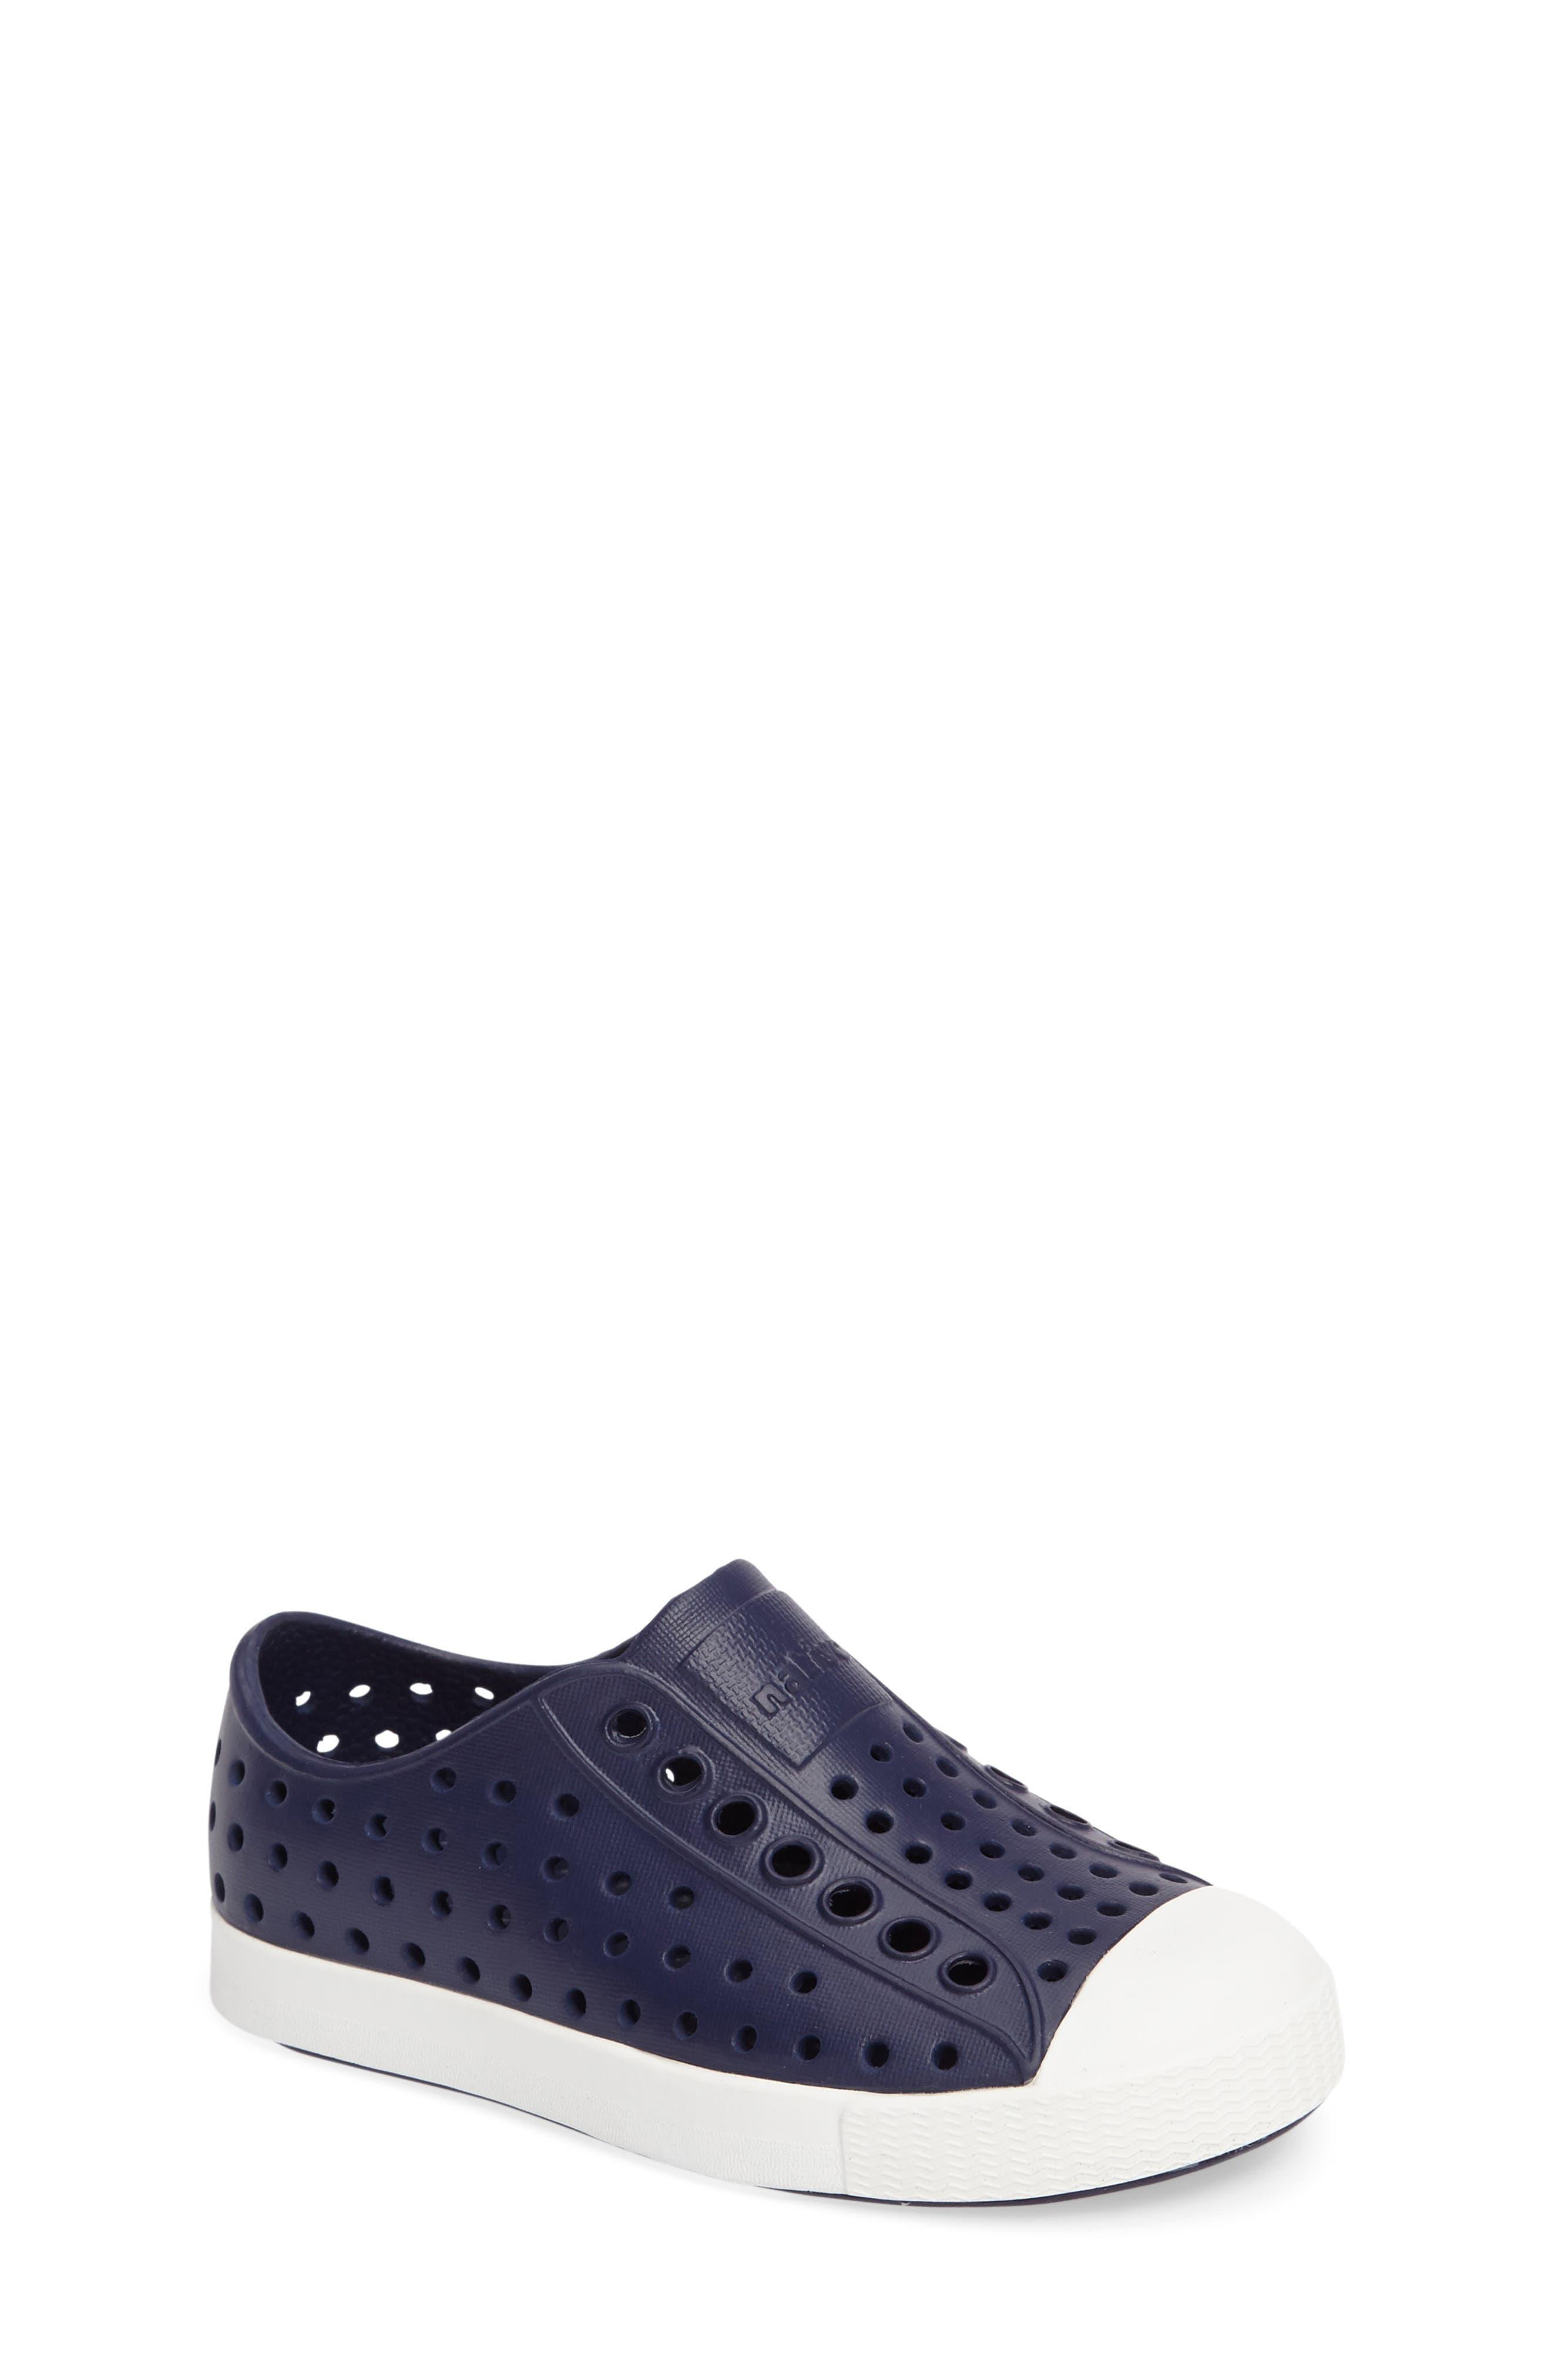 NATIVE SHOES Jefferson Water Friendly Slip-On Vegan Sneaker, Main, color, REGATTA BLUE/ SHELL WHITE